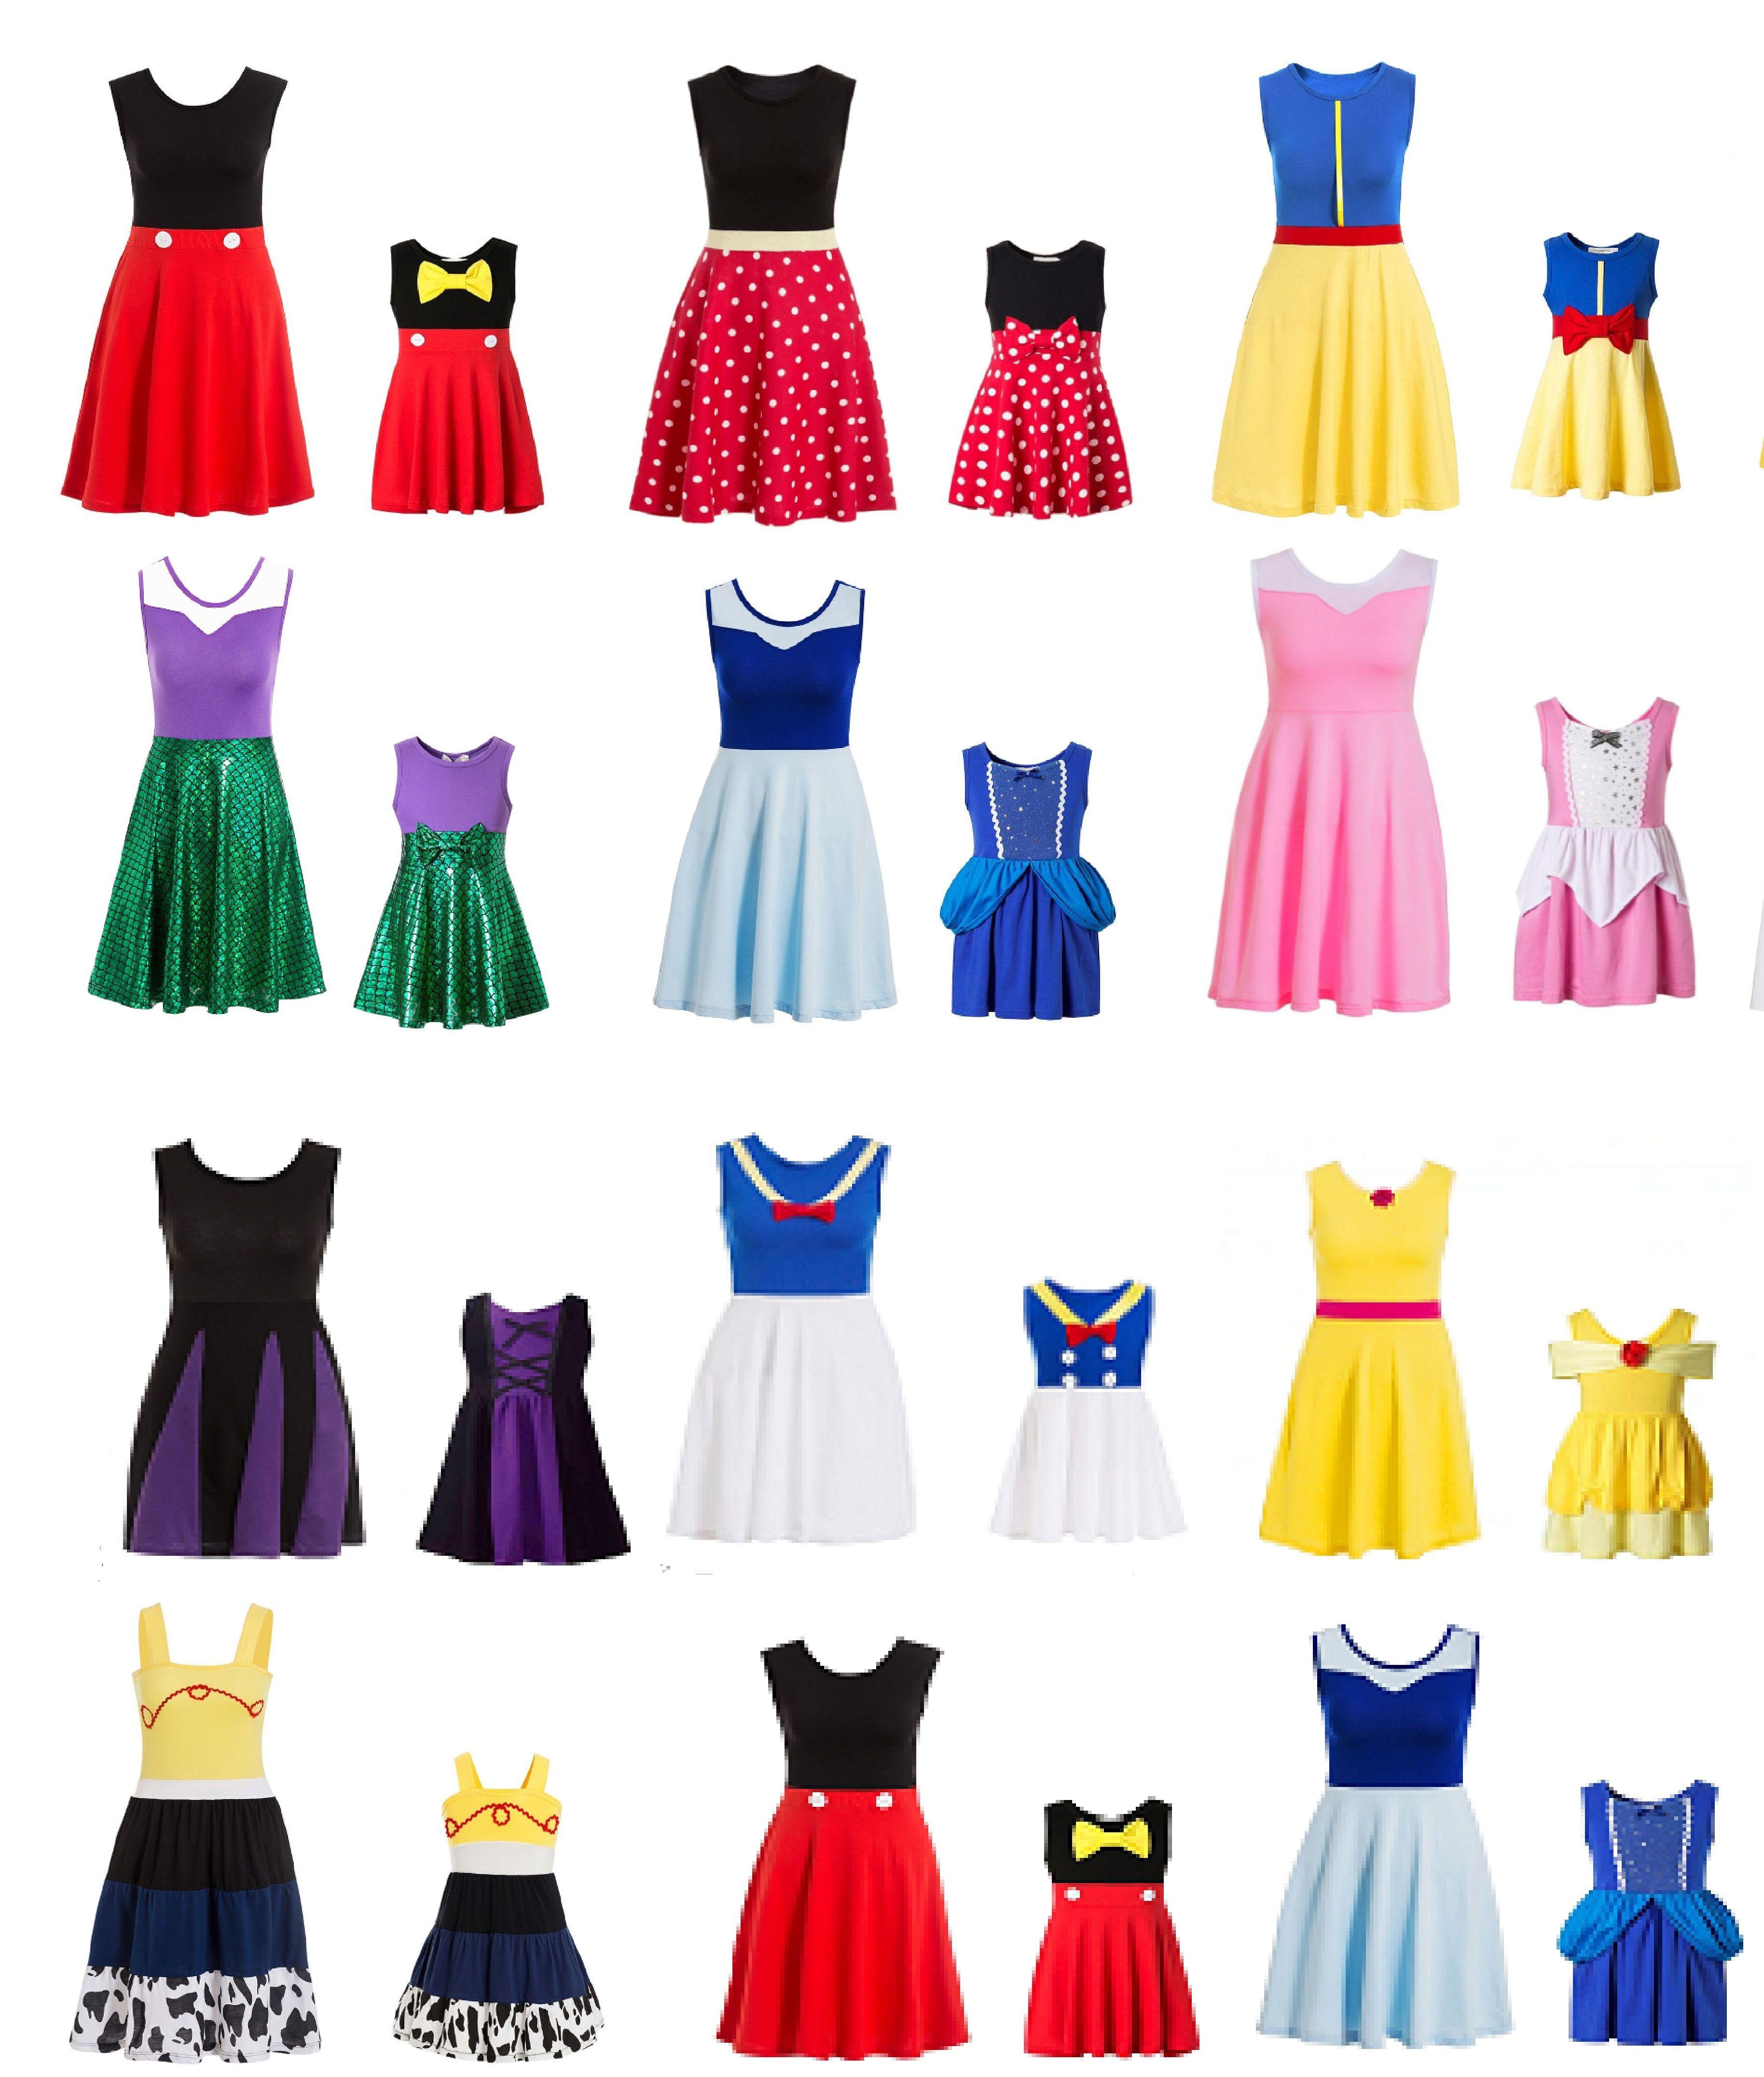 Taille adulte maman robe de princesse Minnie maman et moi correspondant famille cosplay déguisement grande taille robe de princesse femme à pois